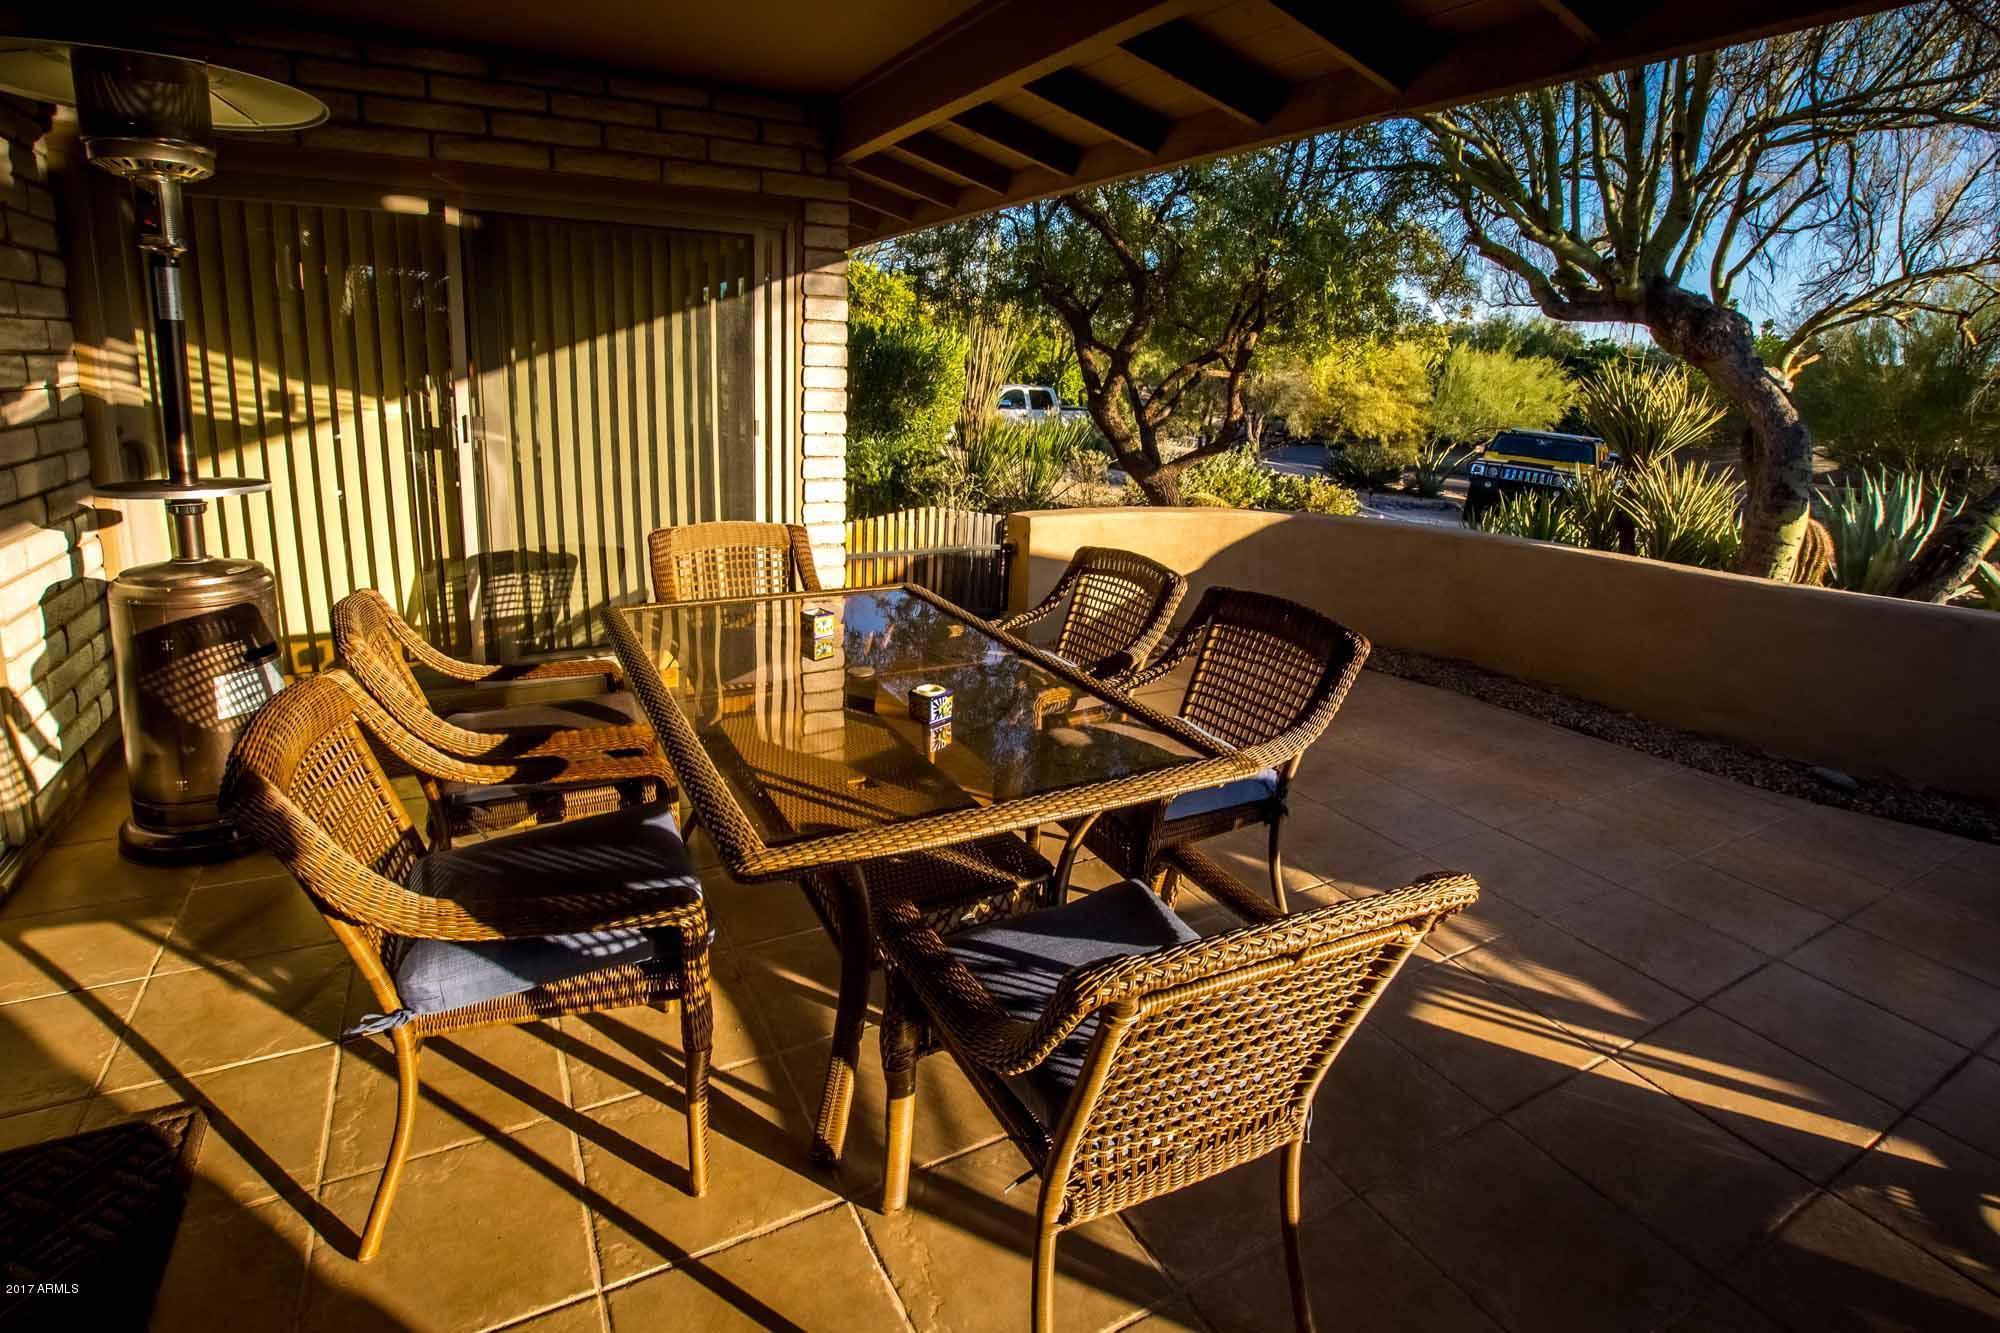 MLS 5565846 7829 E CAREFREE Drive, Carefree, AZ 85377 Carefree AZ Affordable